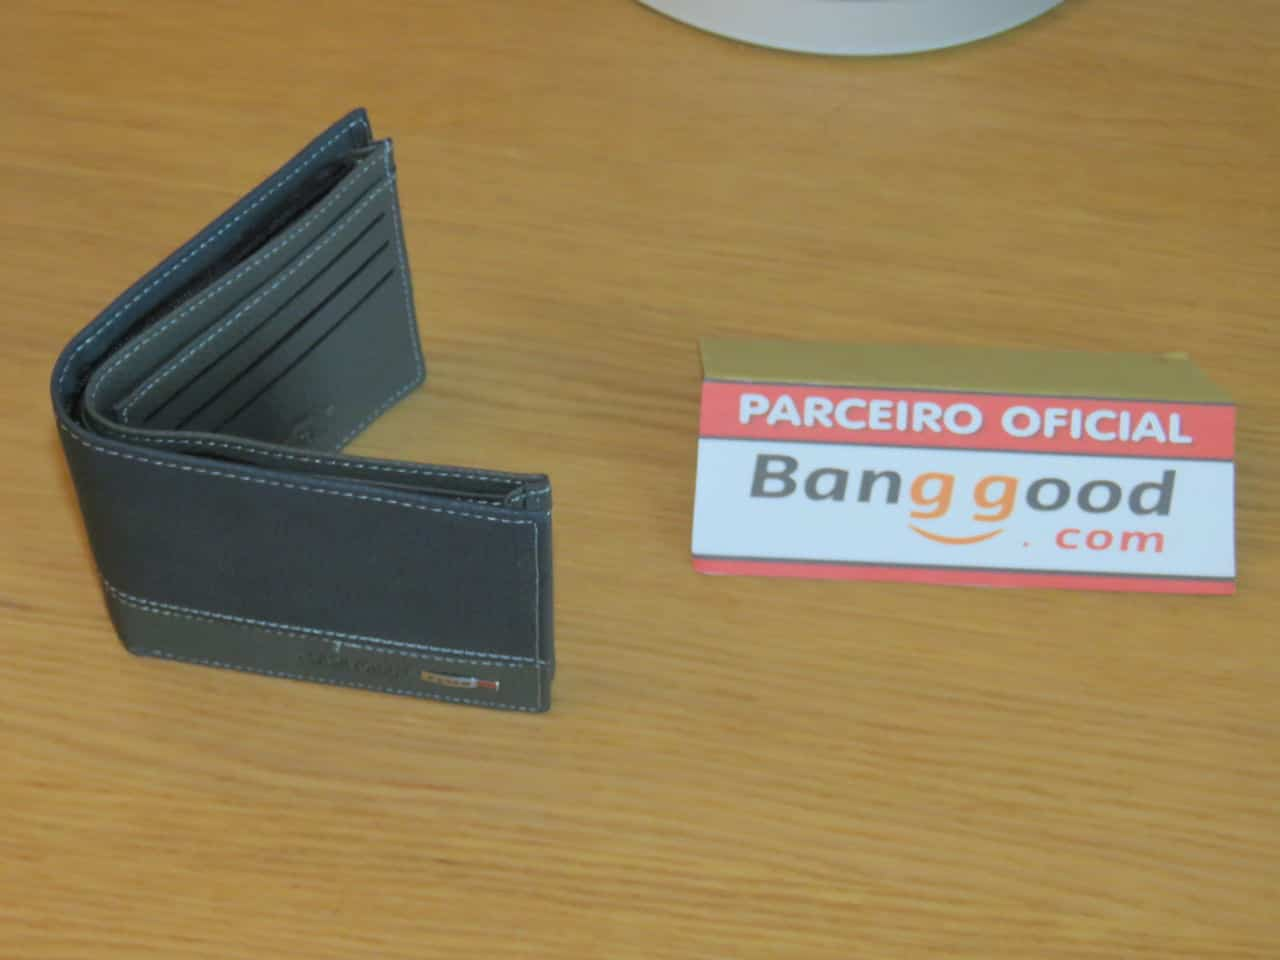 OPORTUNIDADE  [Provado] Banggood - Comprar na China é SEGURO, BARATO E RÁPIDO! (Armazém na Europa) - Página 7 Foto_1